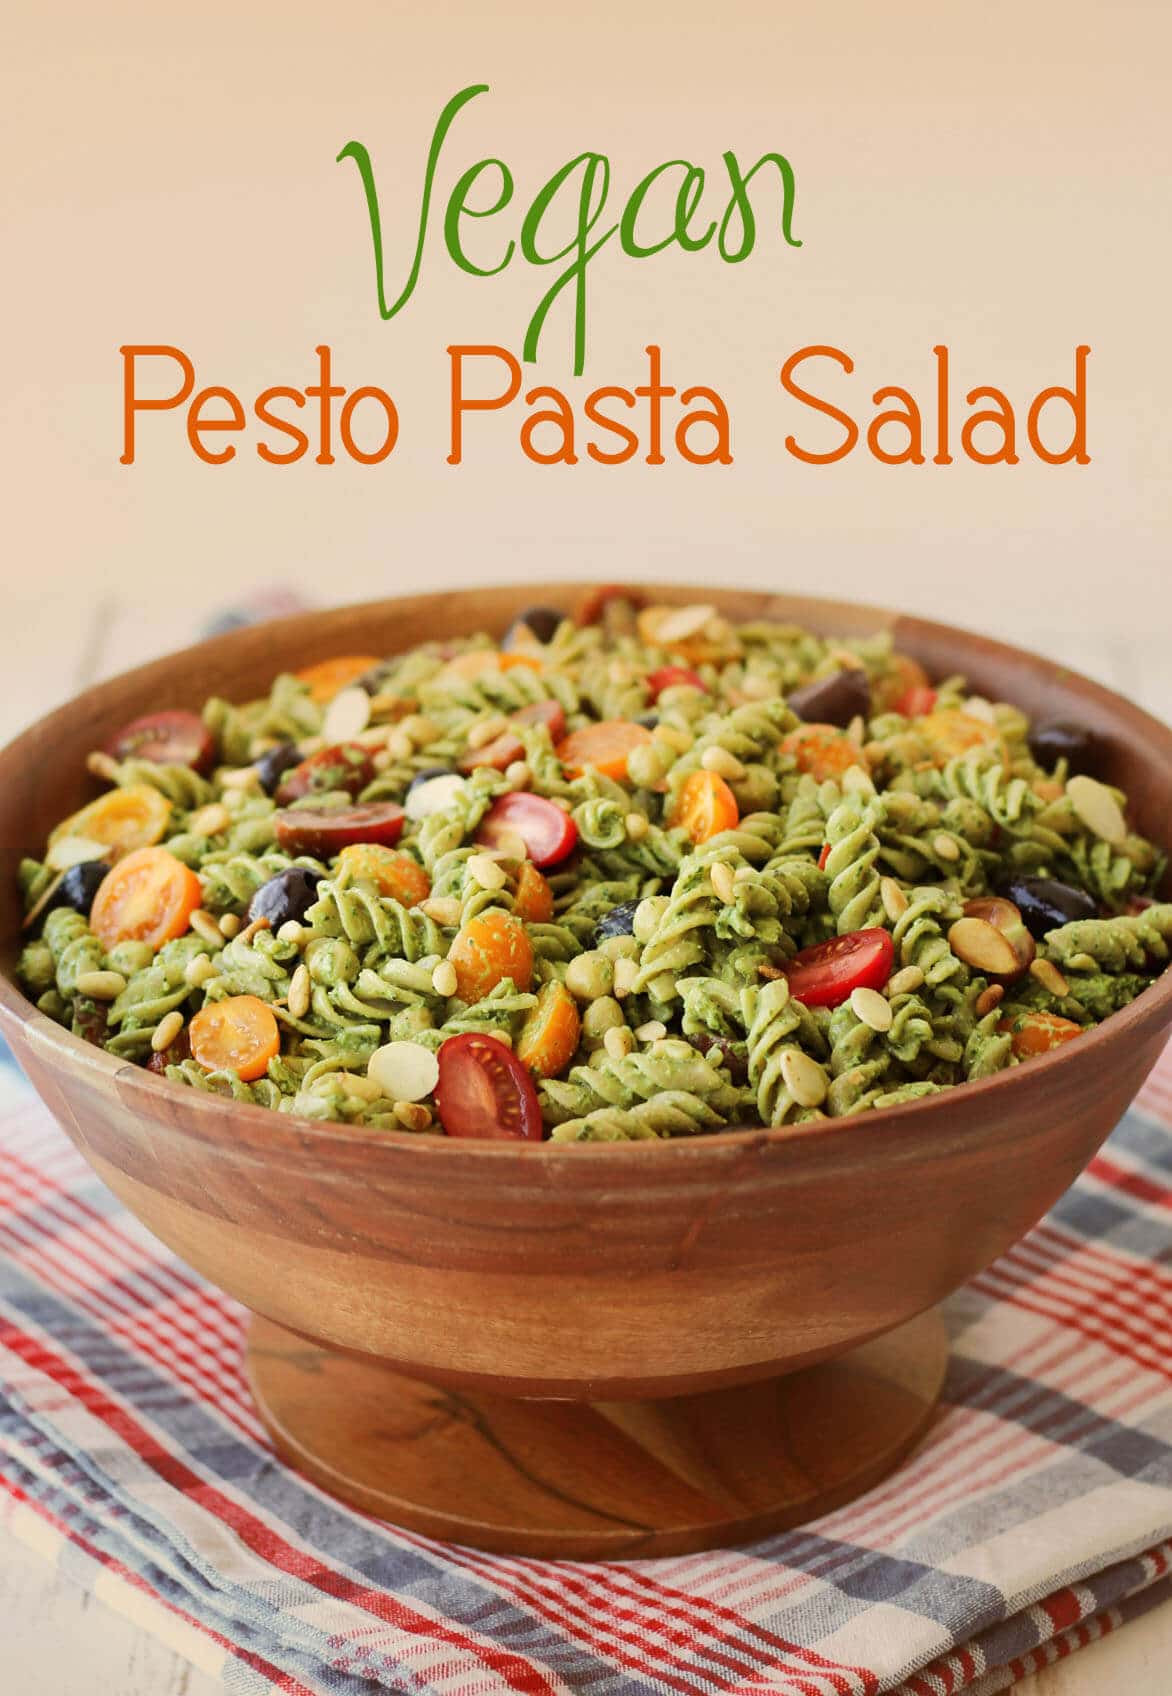 Healthy Pesto Pasta Salad Recipe  Vegan Pesto Gluten Free Pasta Salad